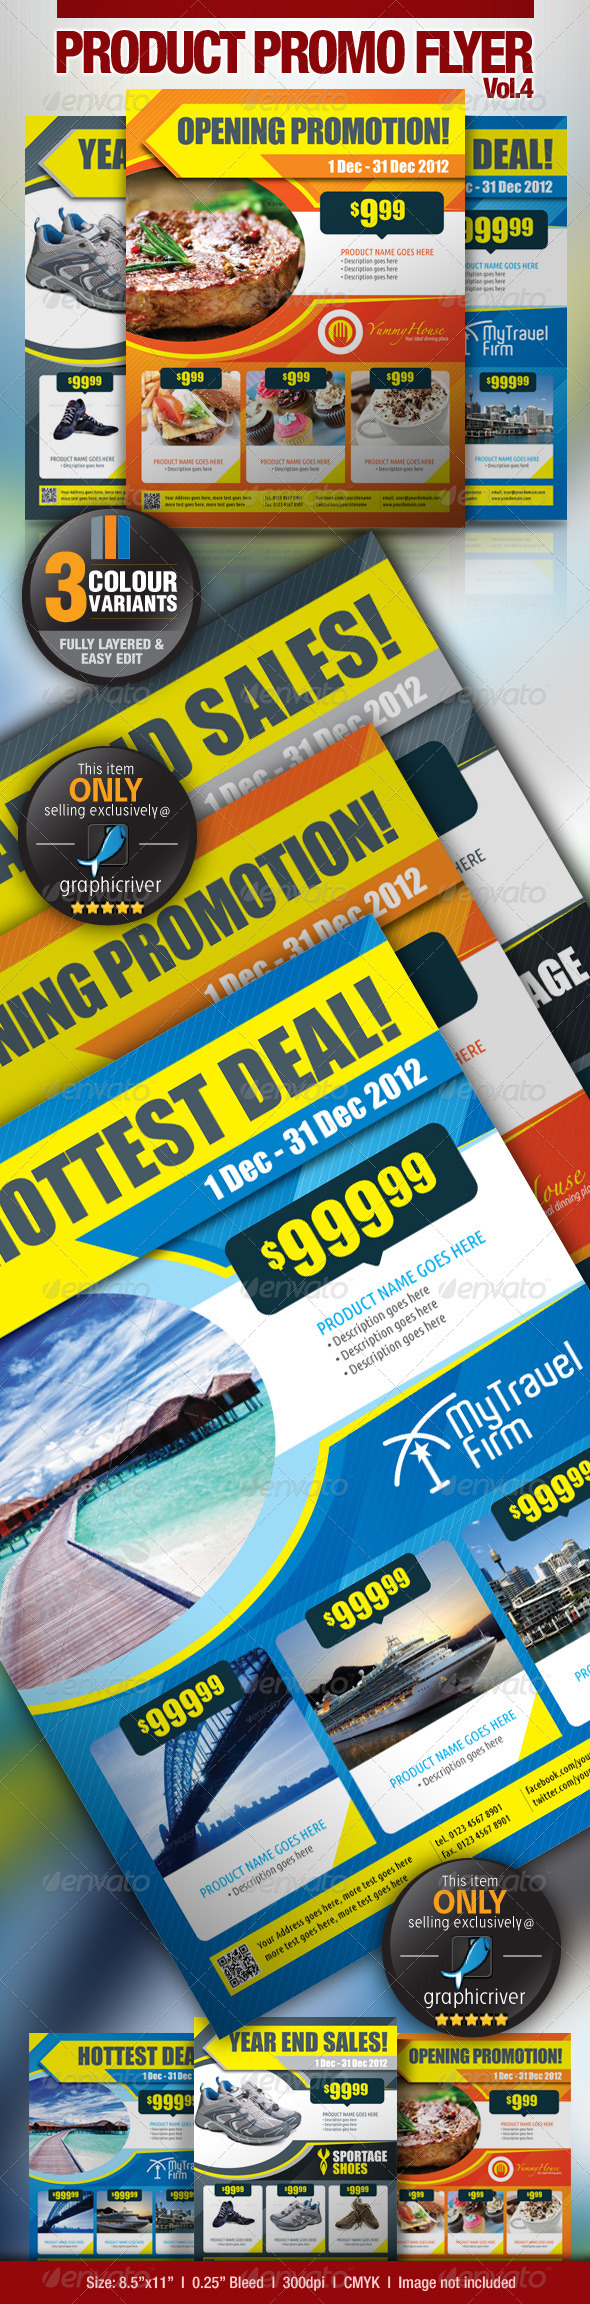 GraphicRiver Multi-Purpose Product Promotion Vol.4 3099896